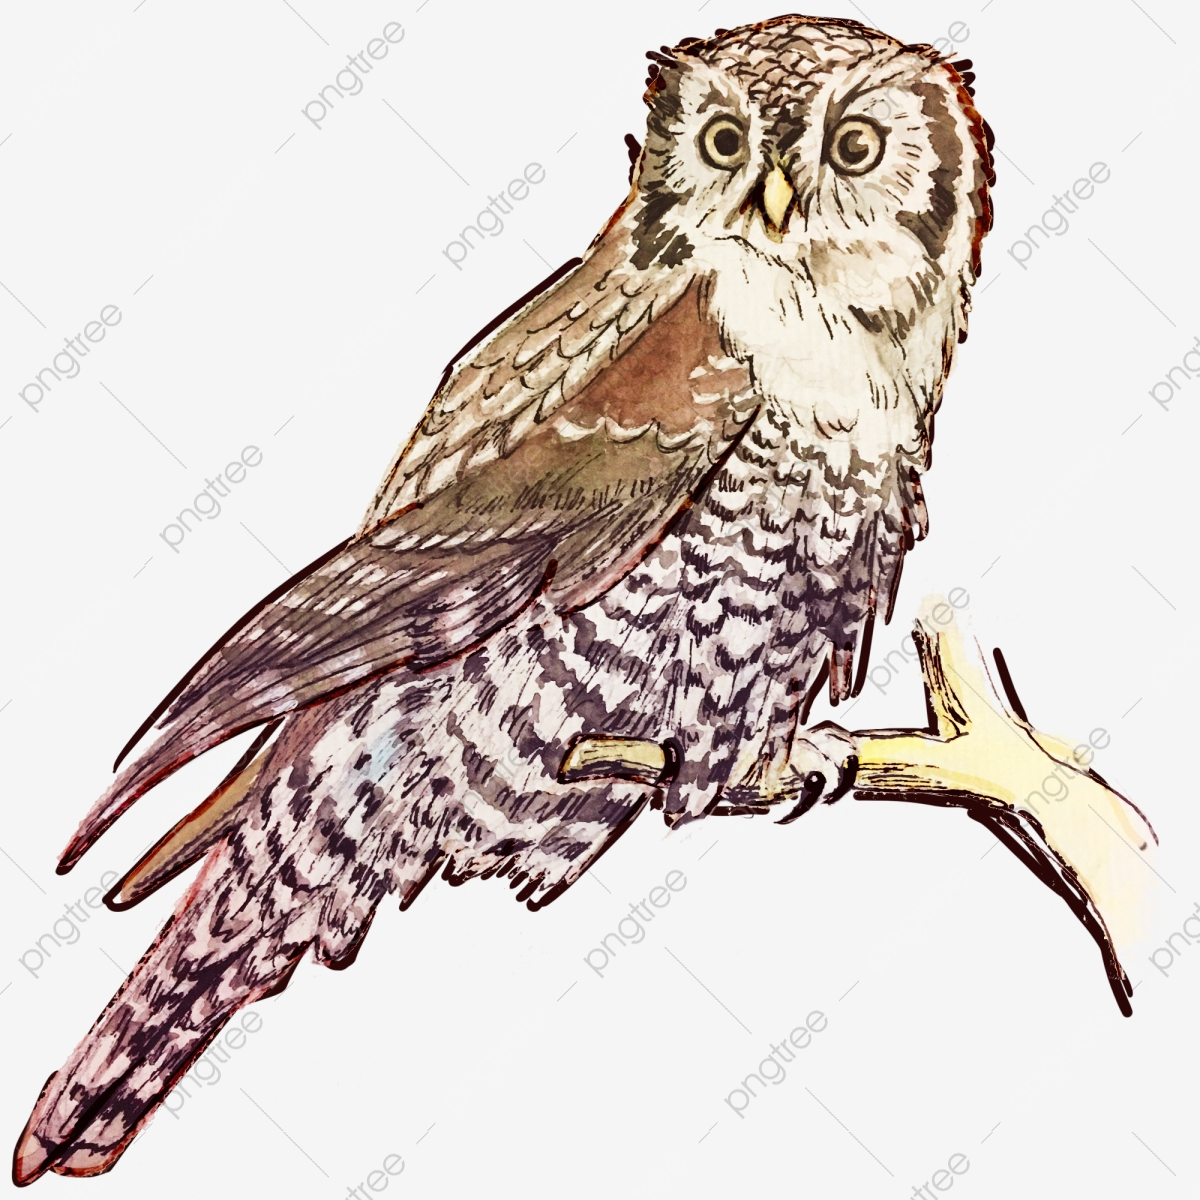 Cartoon Tree Owl Tree Clipart Owl Clipart Cartoon Clipart Png Transparent Image And Clipart For Free Download Cartoon tree owls illustrations & vectors. https pngtree com freepng cartoon tree owl 3108754 html